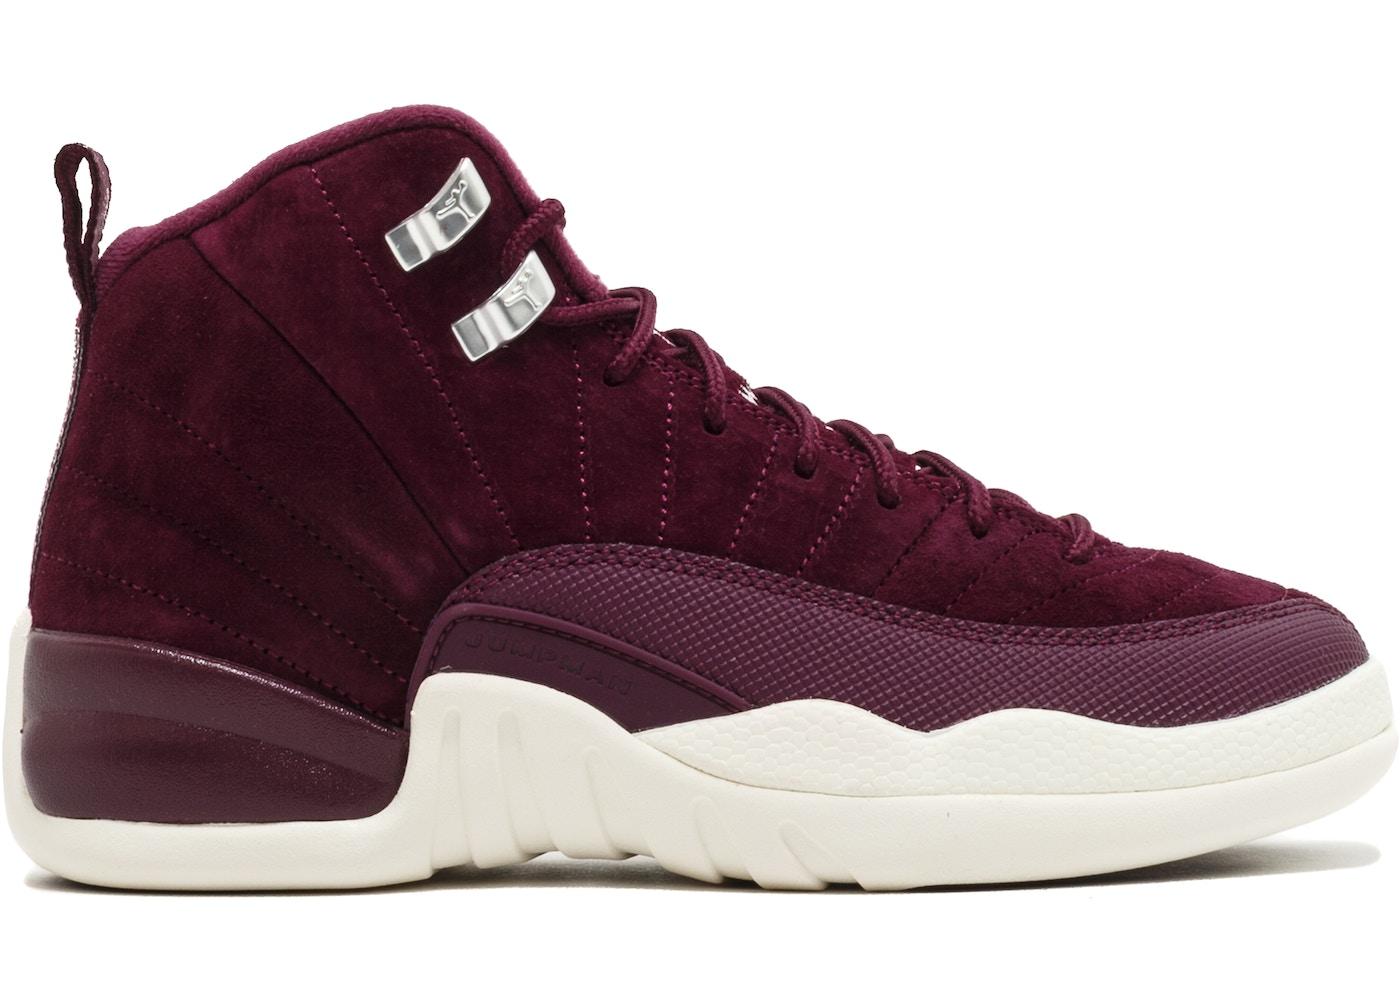 Jordan 12 Retro Bordeaux (GS) - 153265-617 9961e83c3